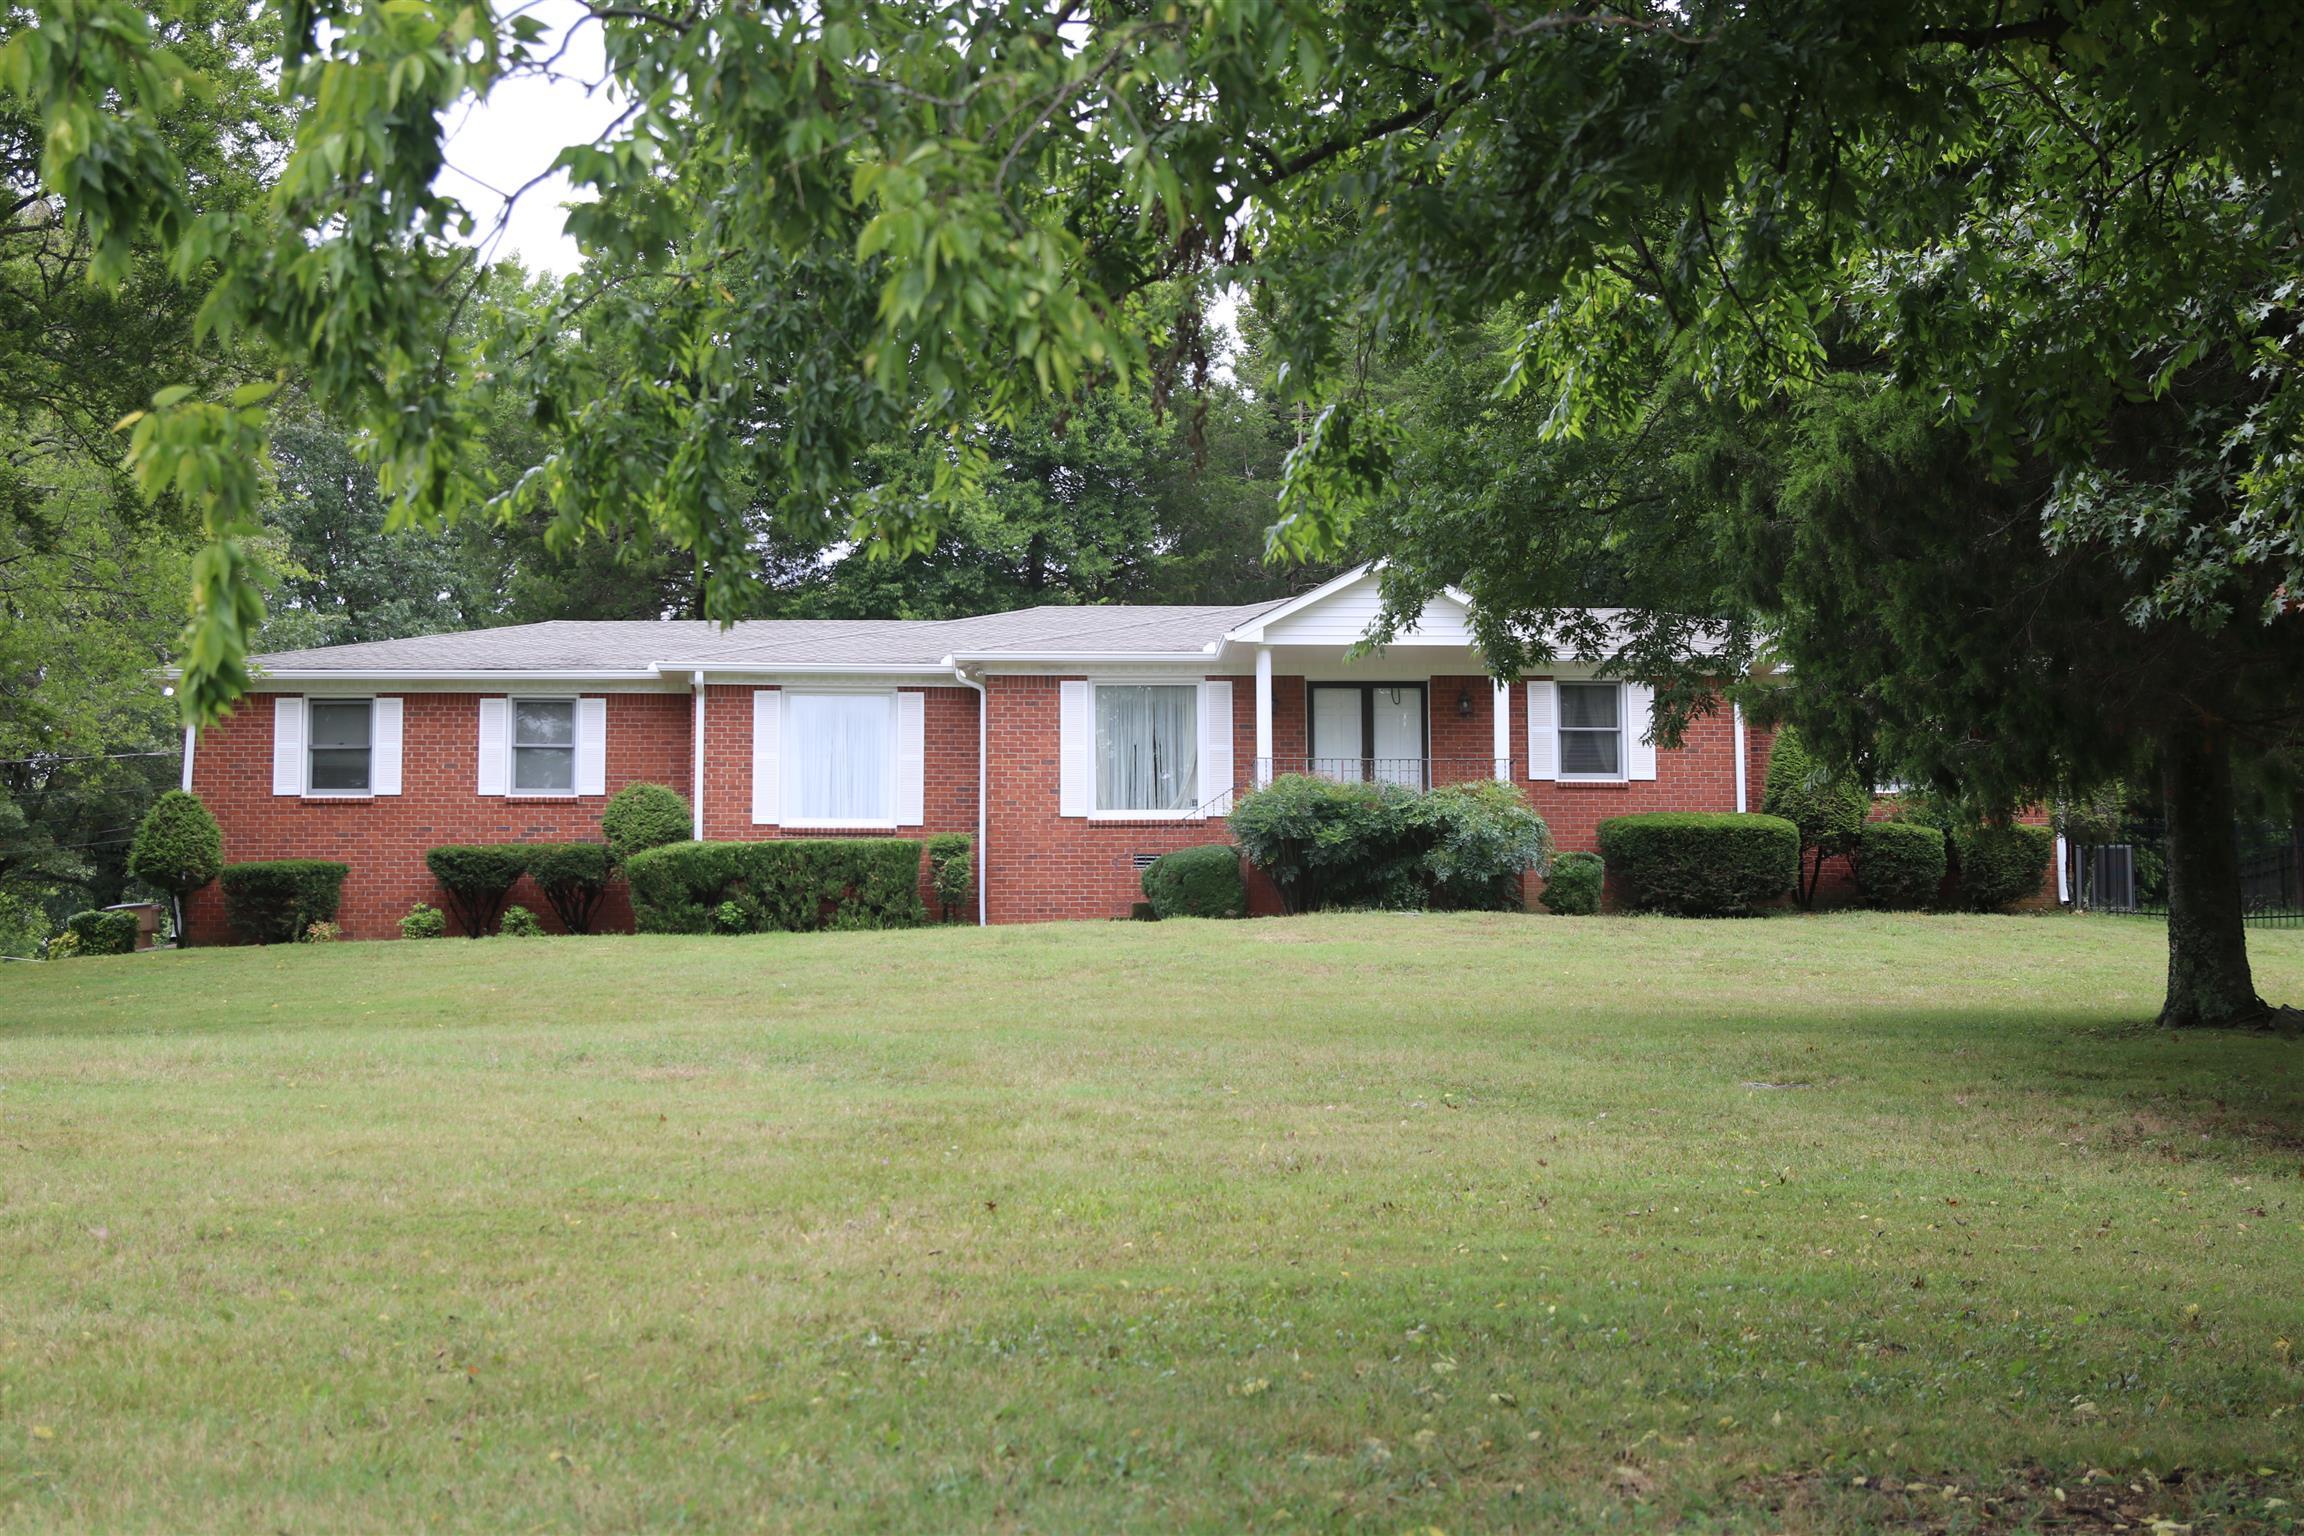 3919 Drakes Branch Rd, Nashville, TN 37218 - Nashville, TN real estate listing